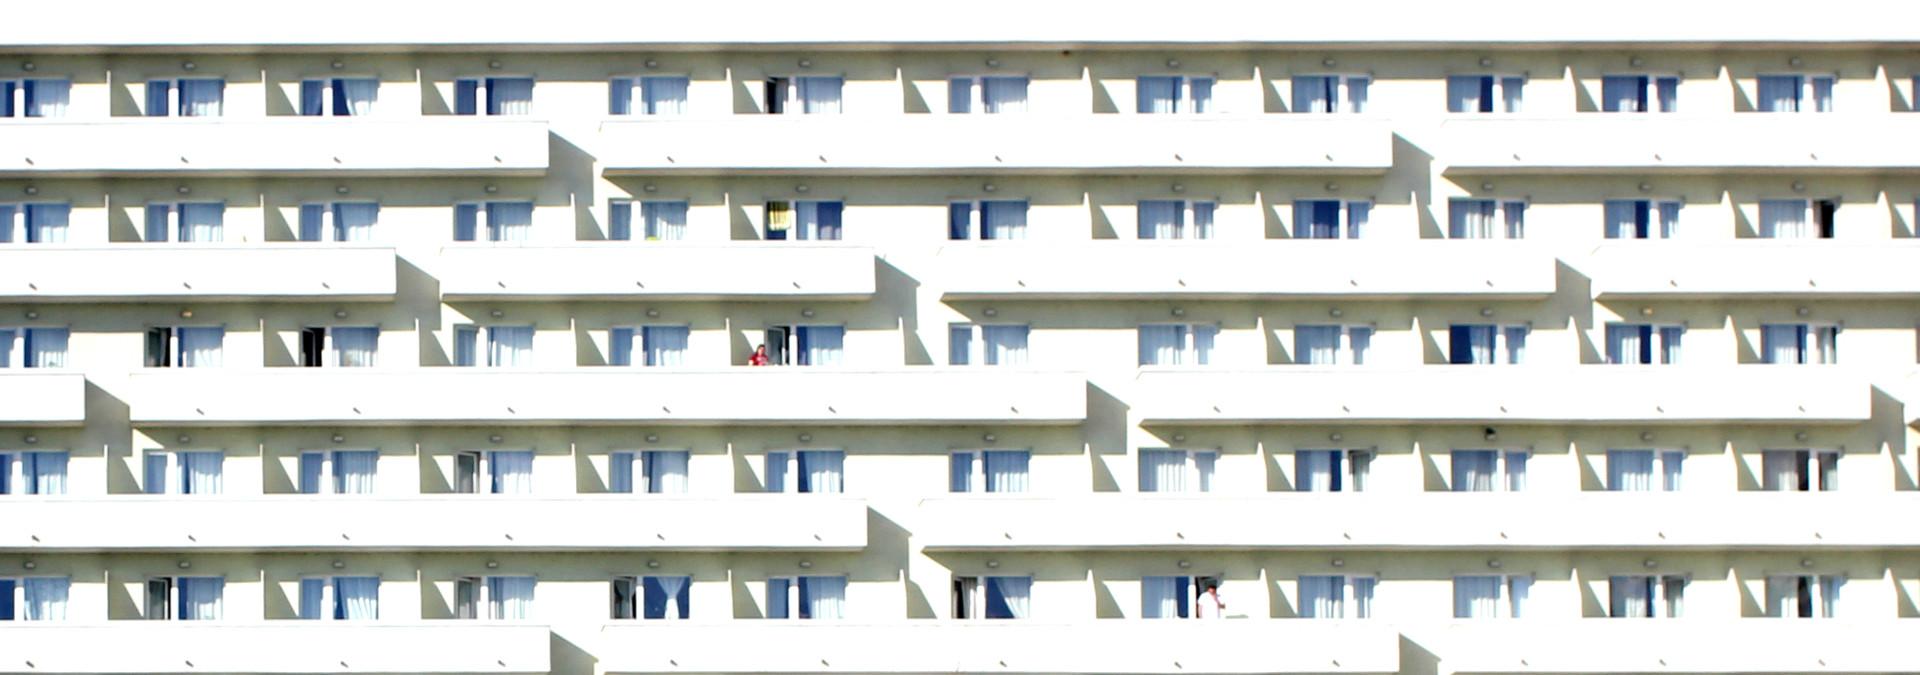 bucarest palazzo terrazze.jpg